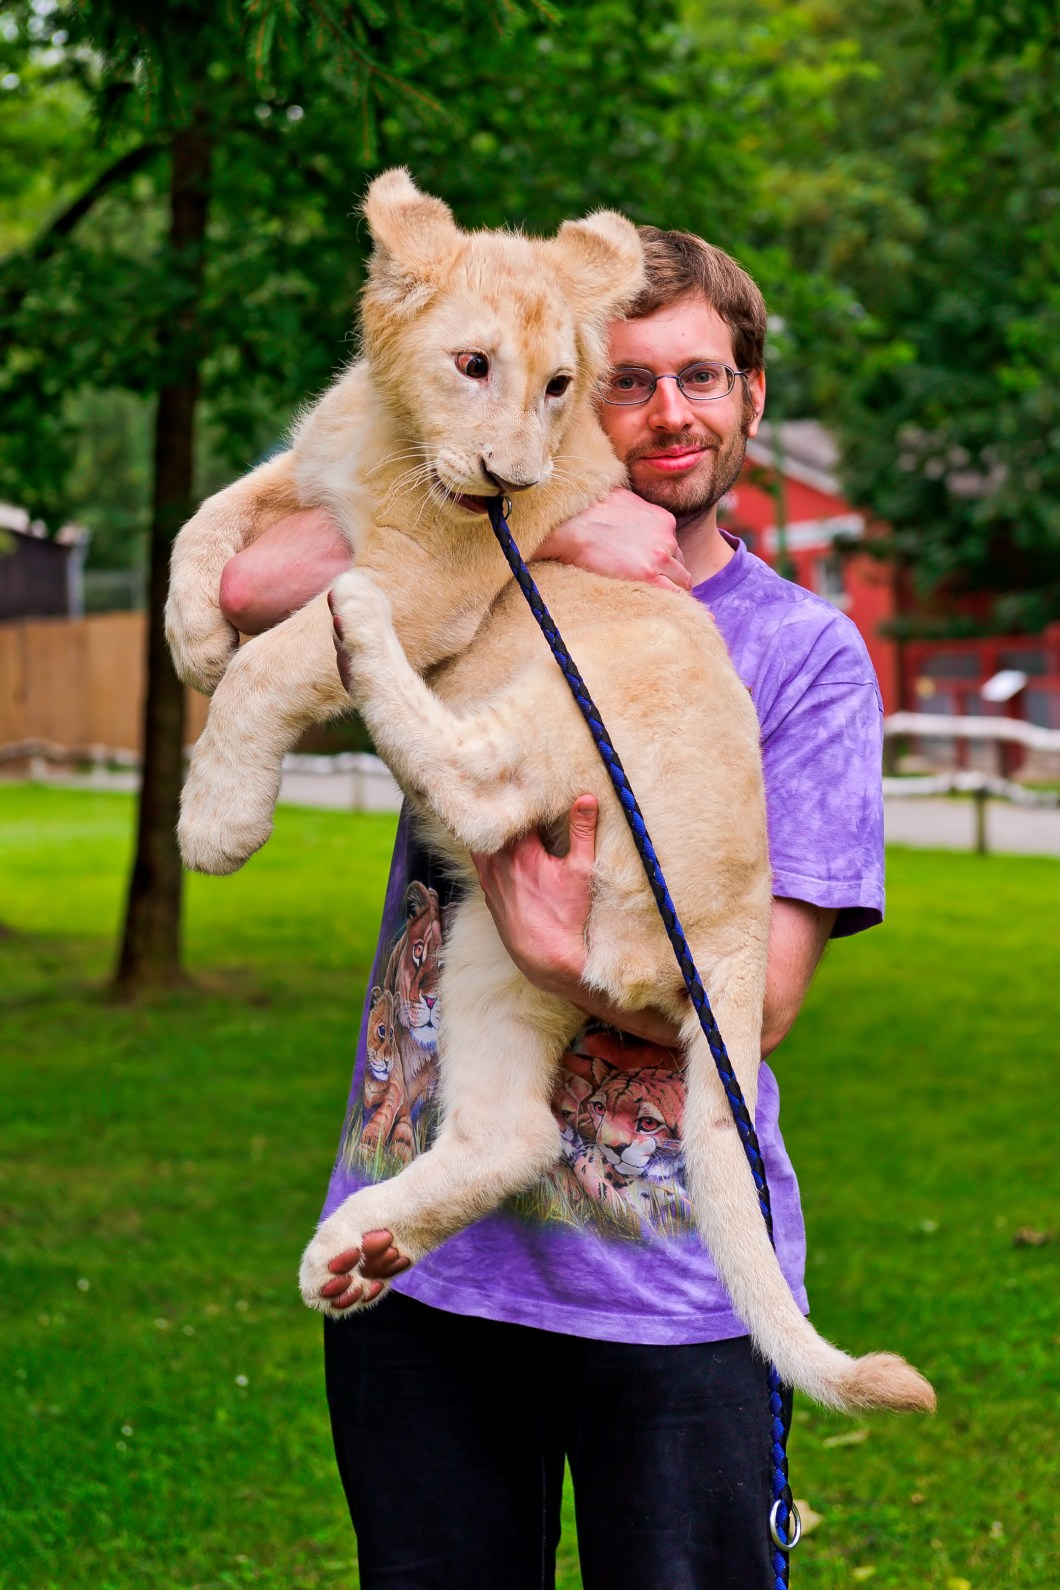 León en brazos